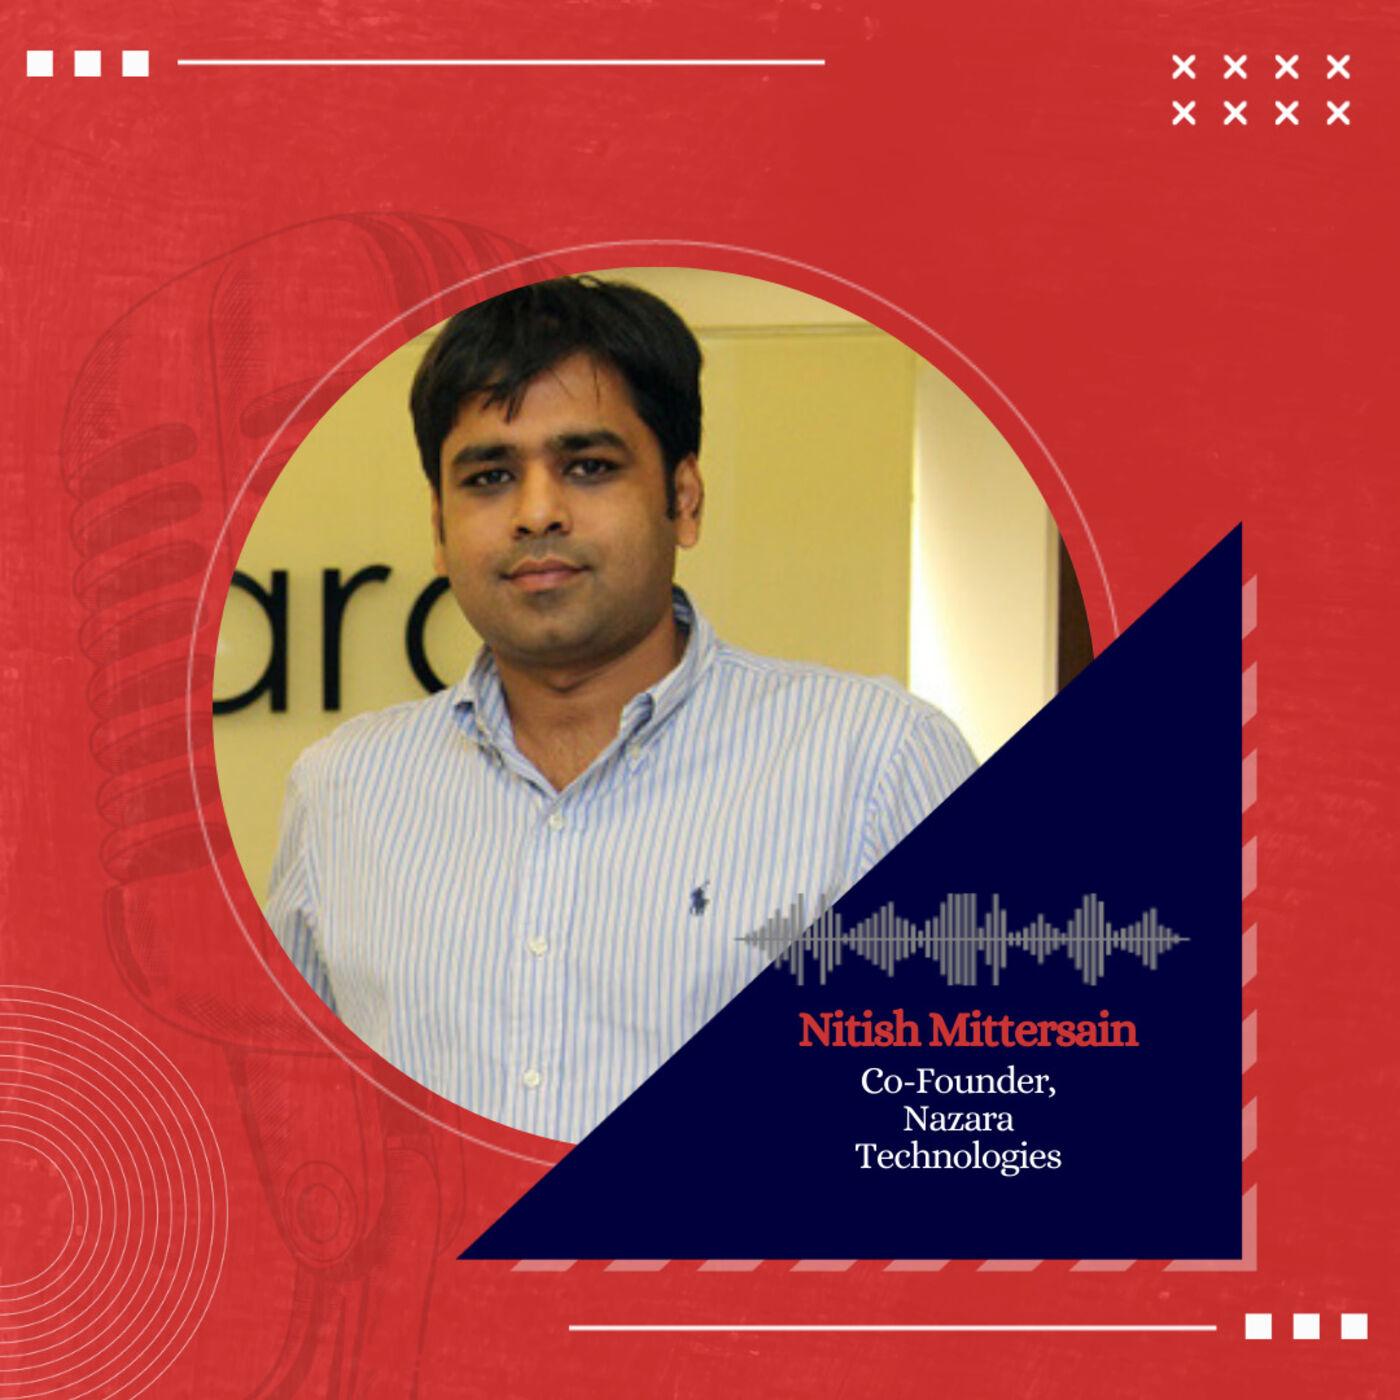 Nitish Mittersain on building Nazara Technologies, a 5000 Crore Gaming company